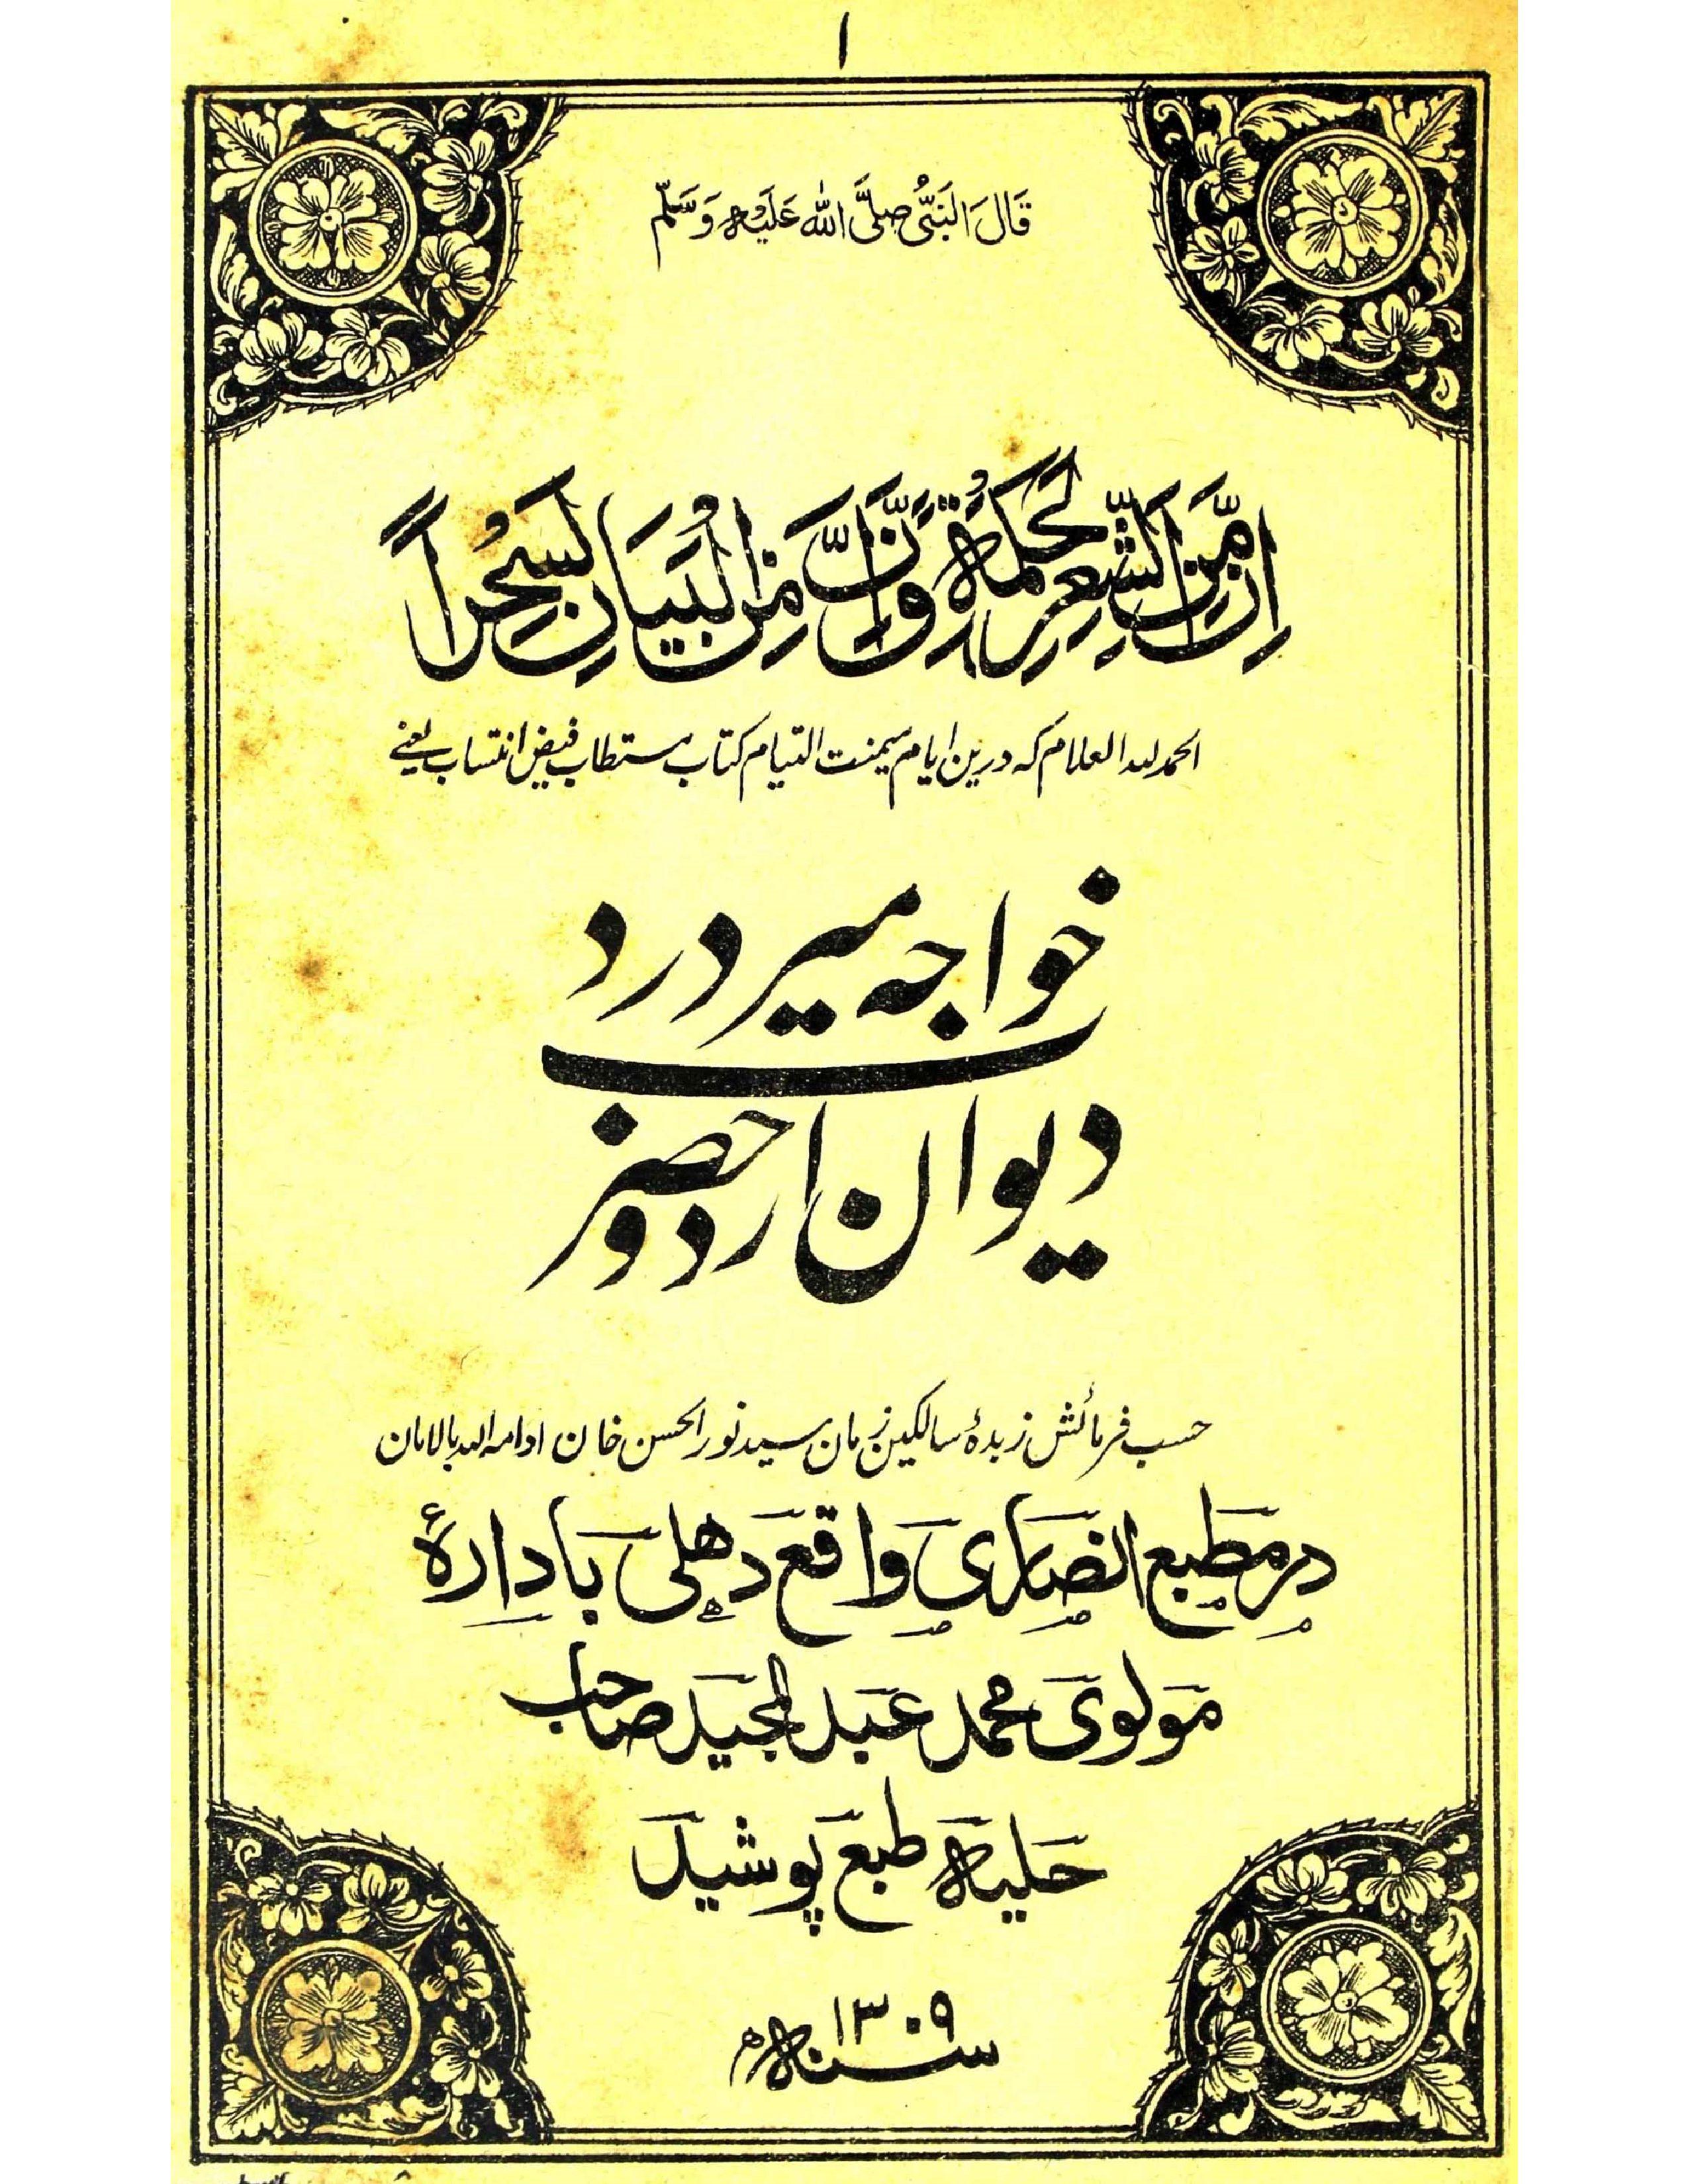 Deewan-e-Urdu Hazrat Khwaja Meer Dard